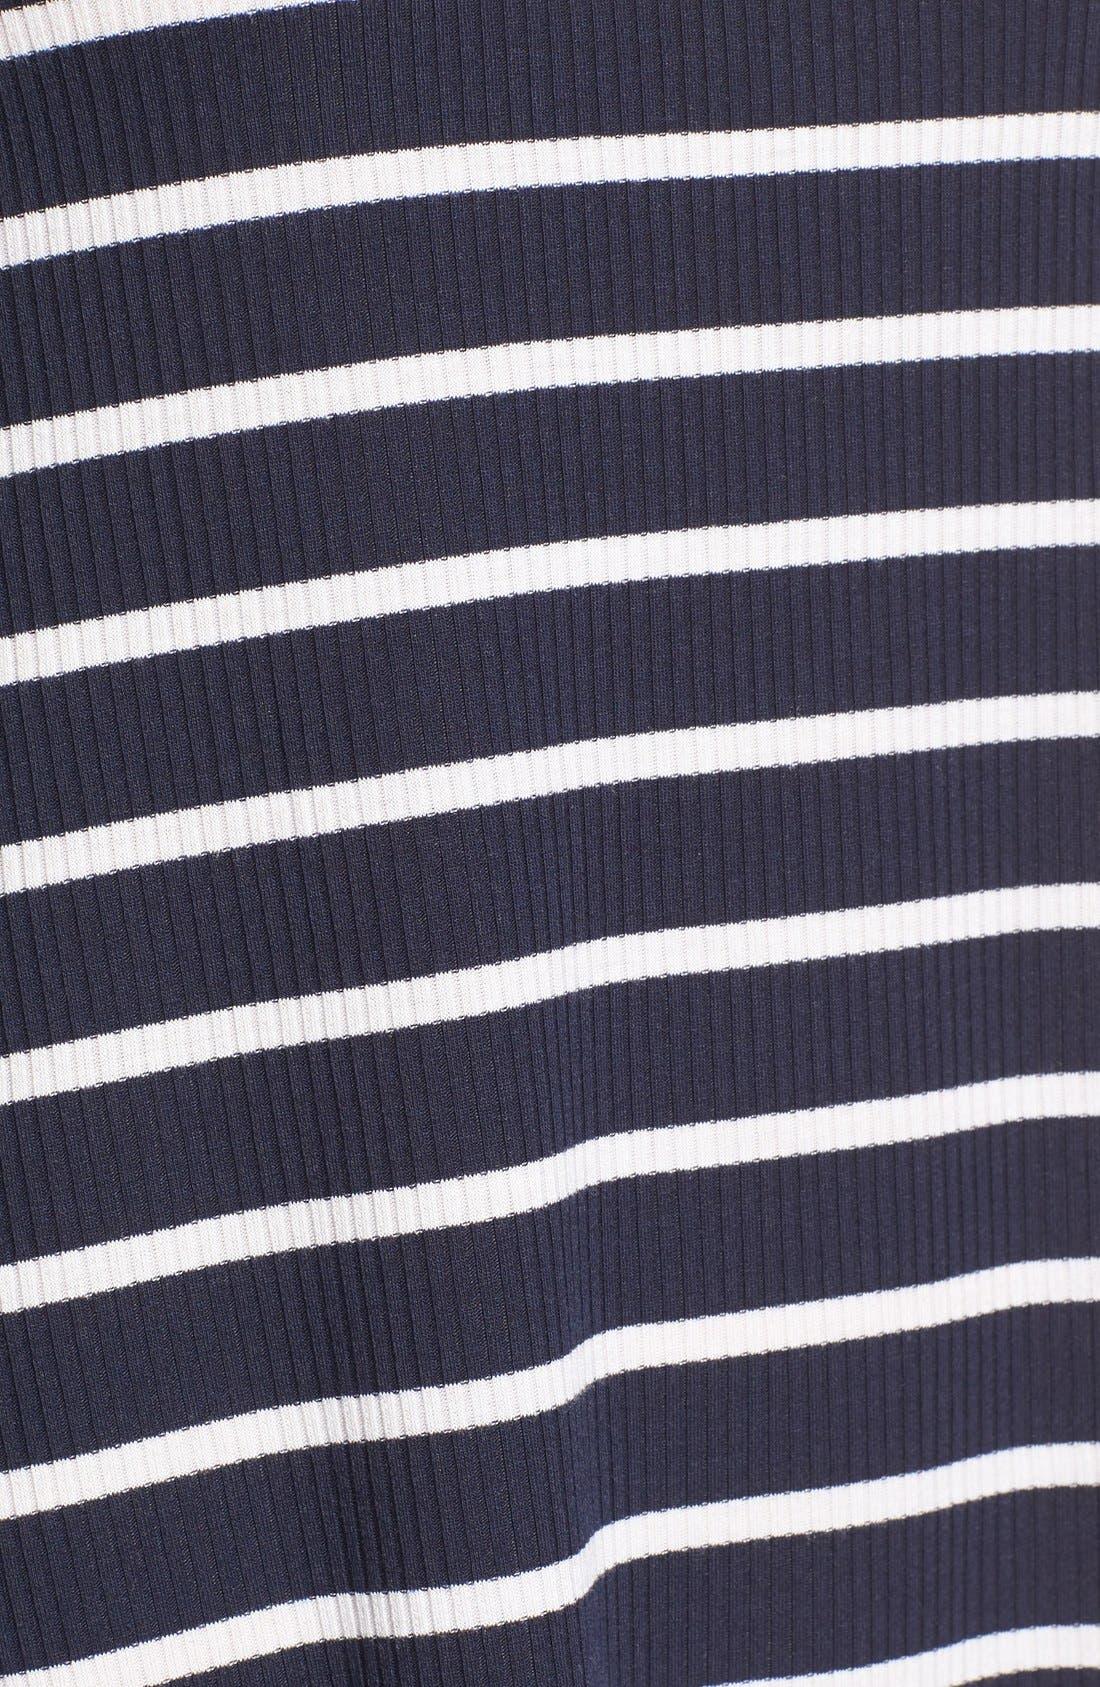 Cowl Neck Shift Dress,                             Alternate thumbnail 64, color,